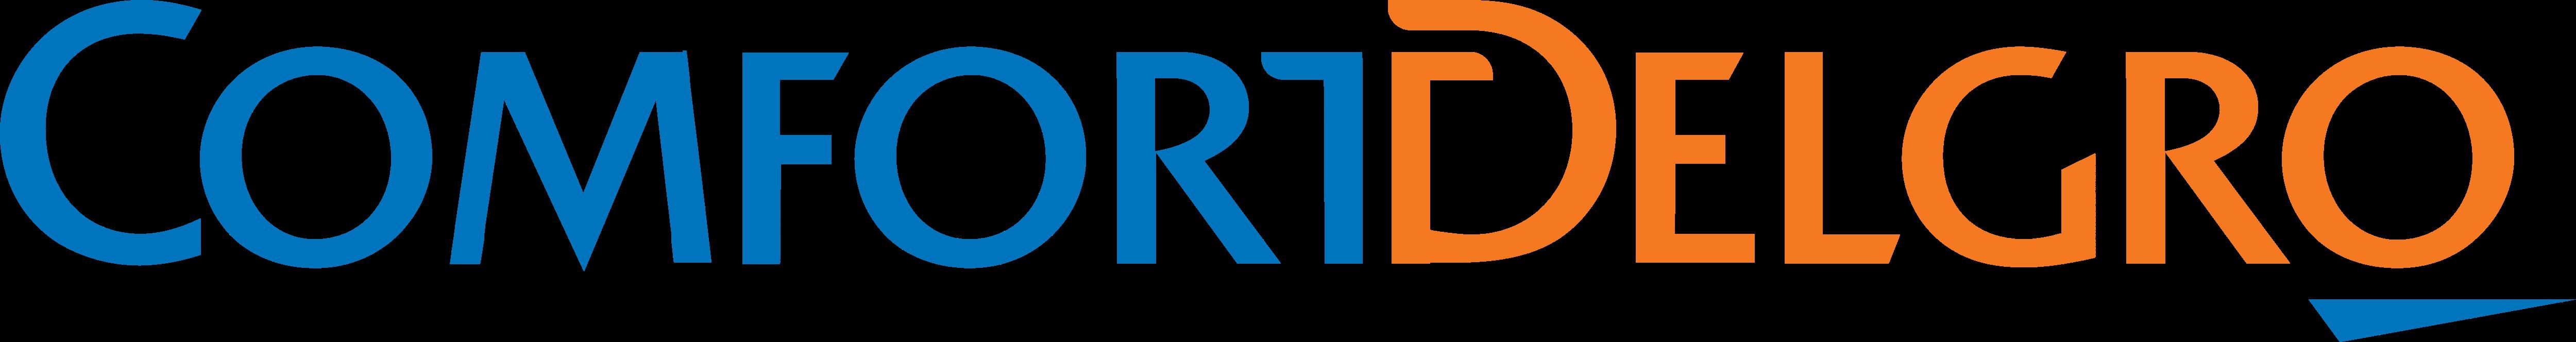 ComfortDelGro – Logos Download